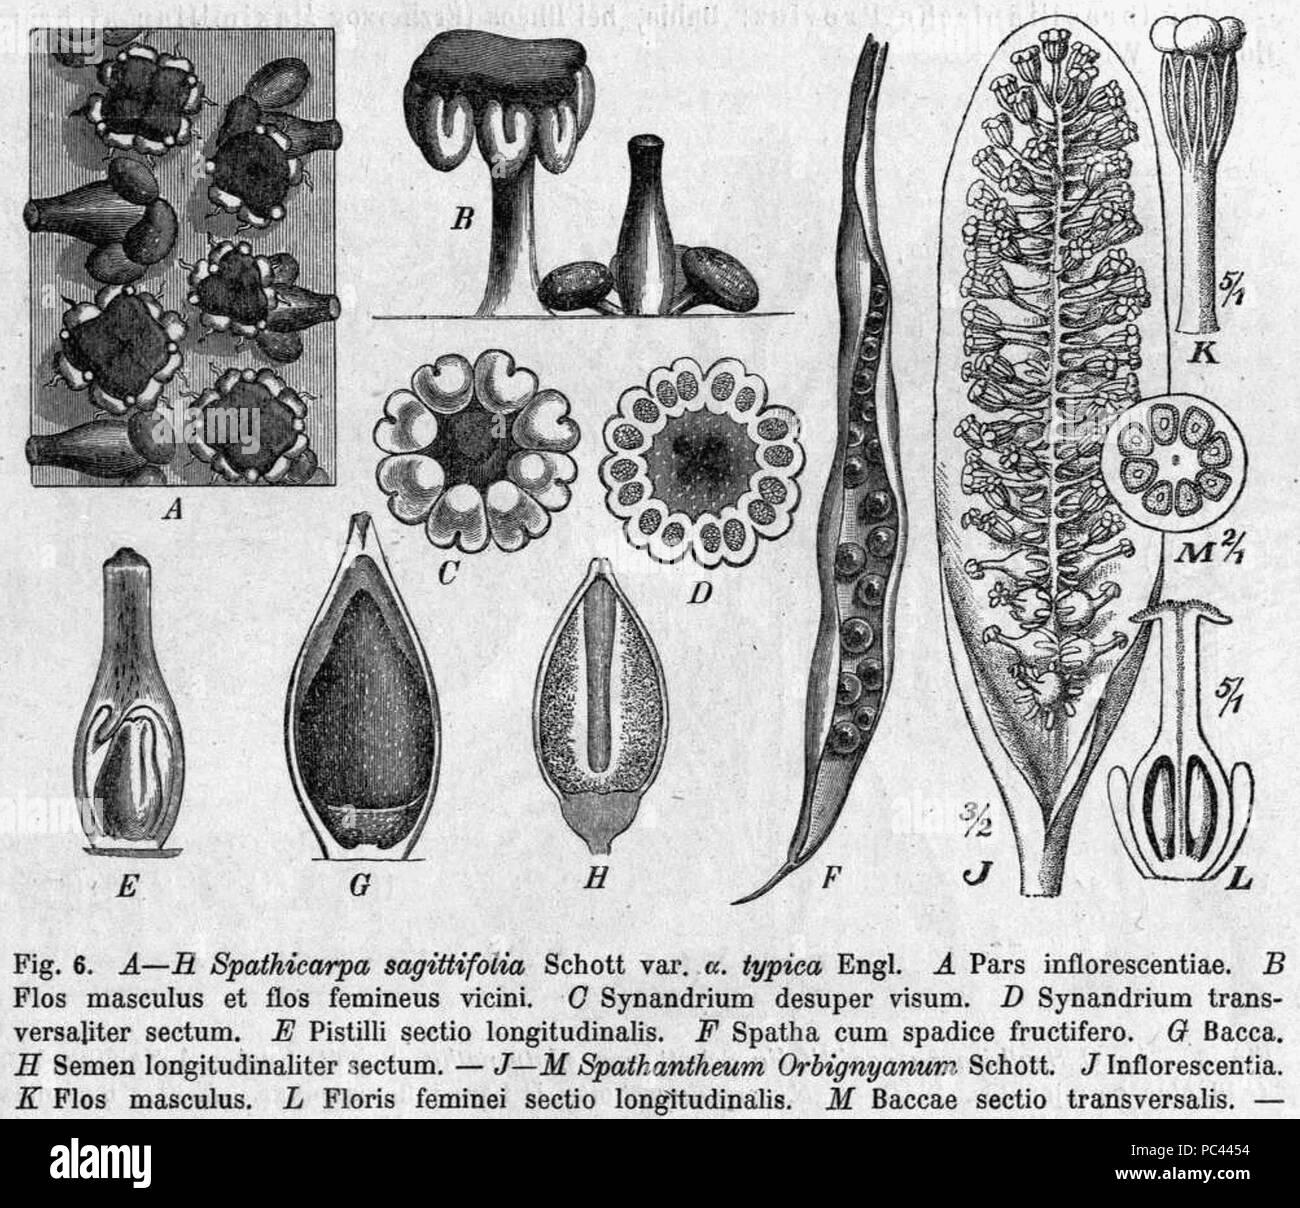 568 Spathicarpa hastifolia morphology Pflanzenreich - Stock Image